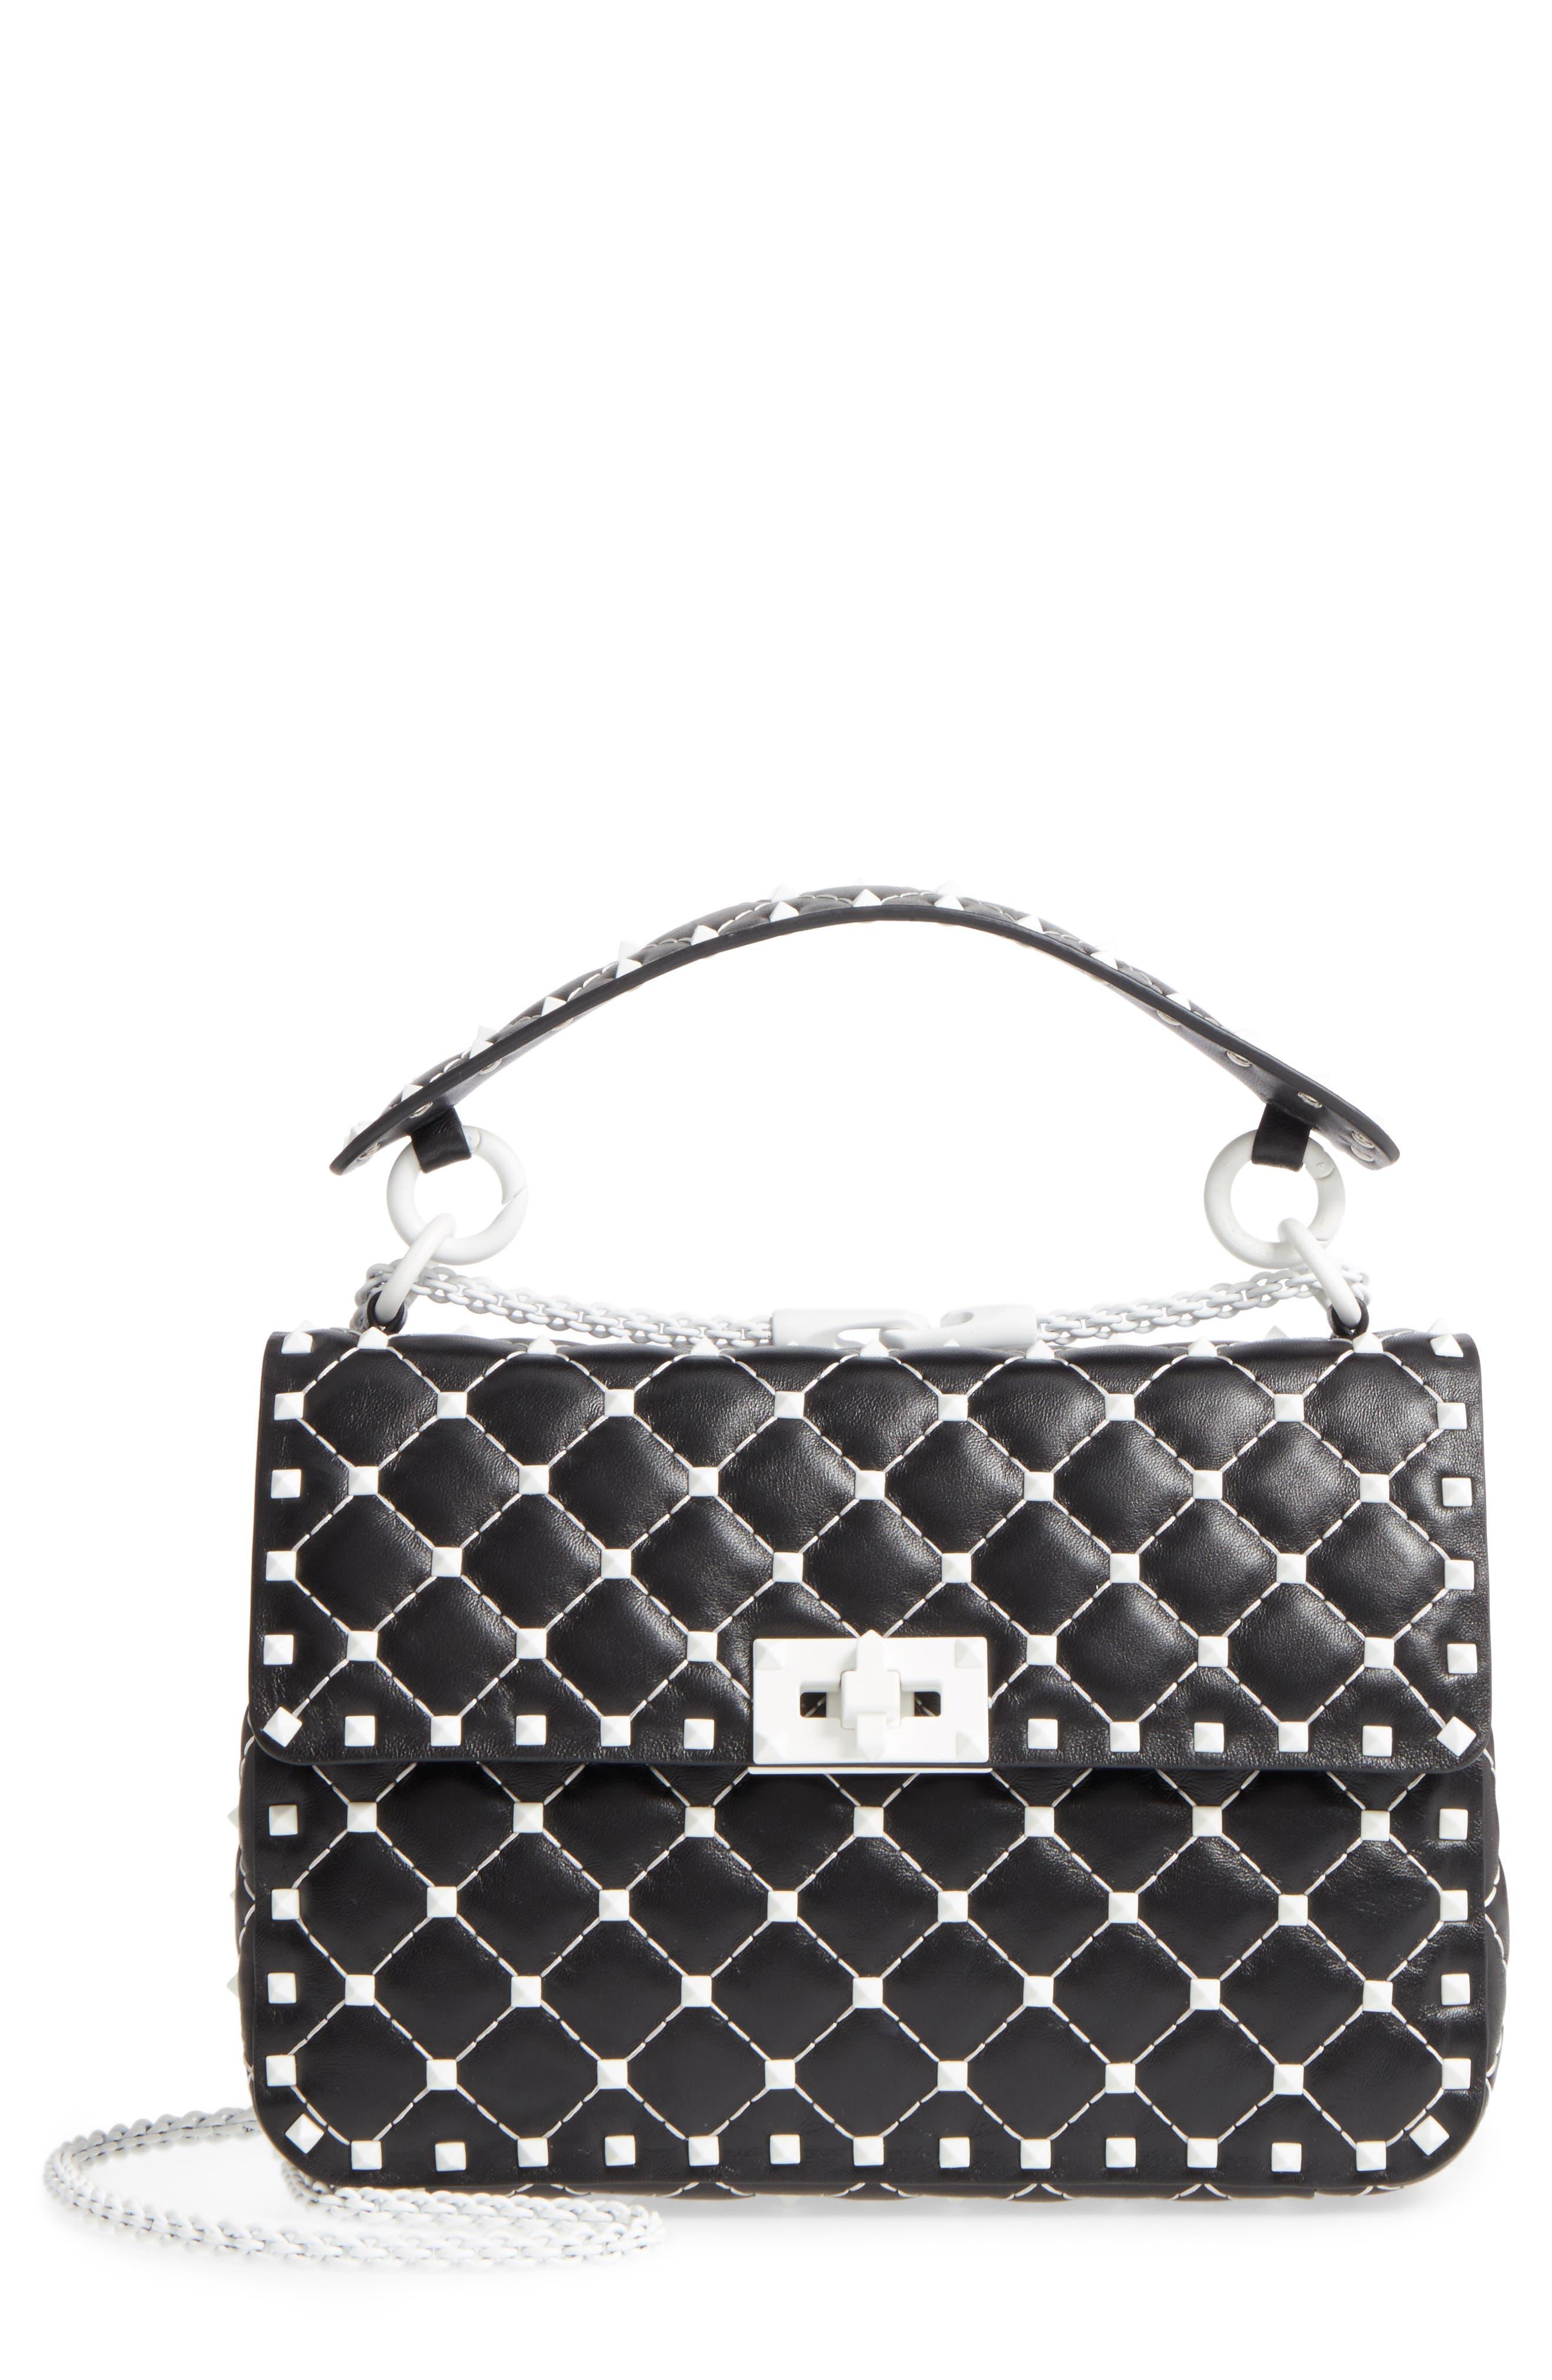 Medium Rockstud Matelassé Leather Shoulder Bag,                         Main,                         color,